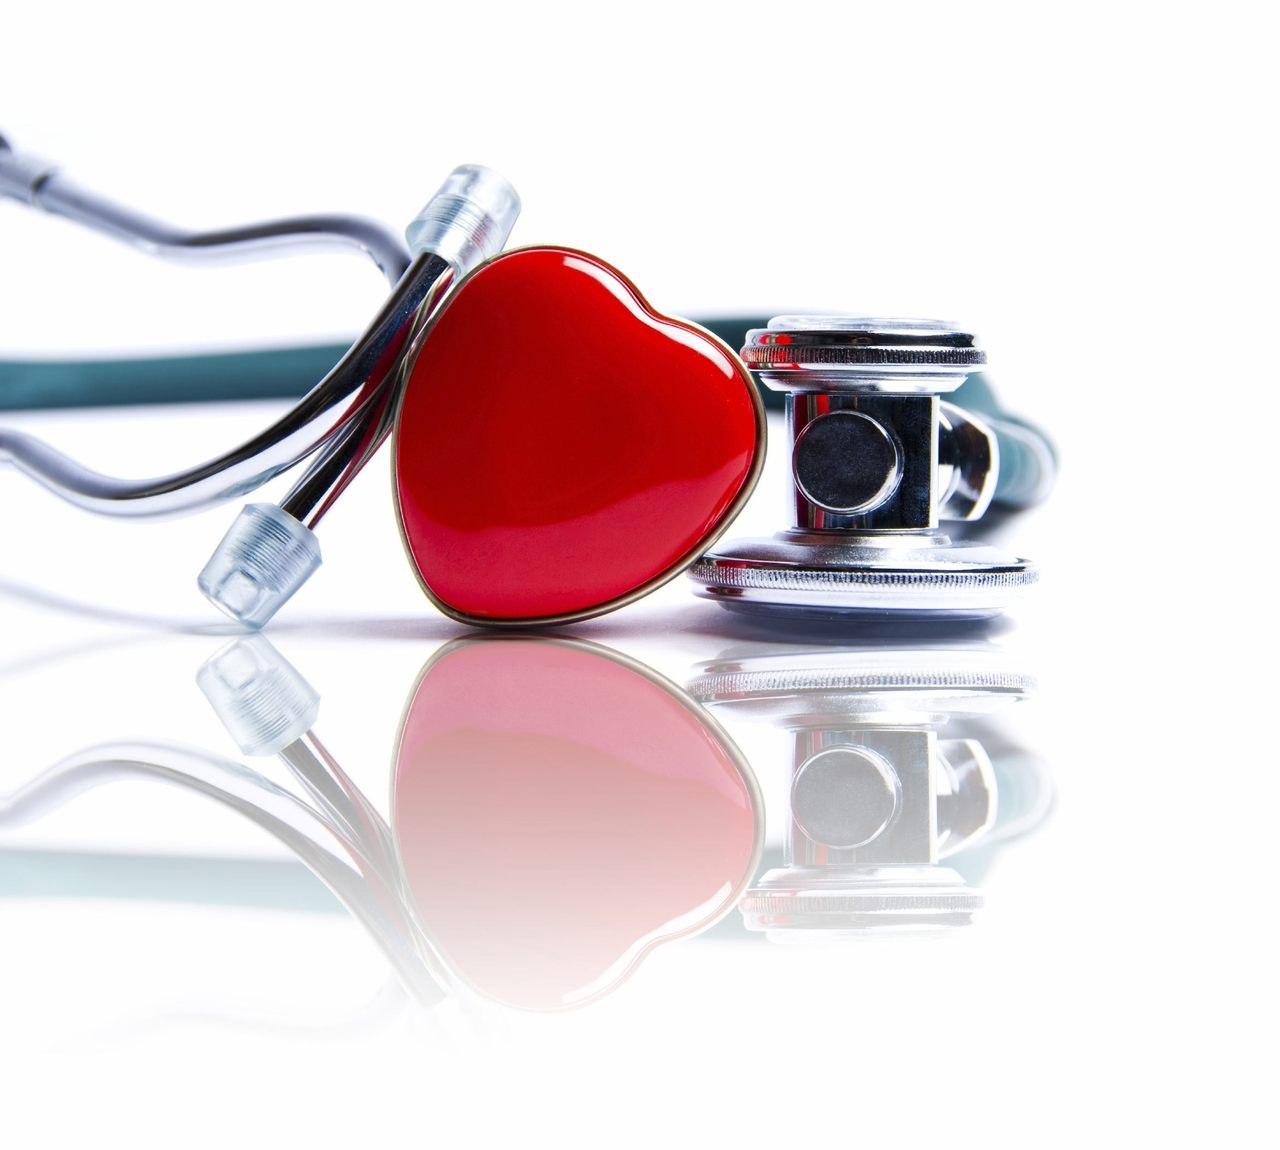 Mediservice Conheça o plano de saúde mediservice